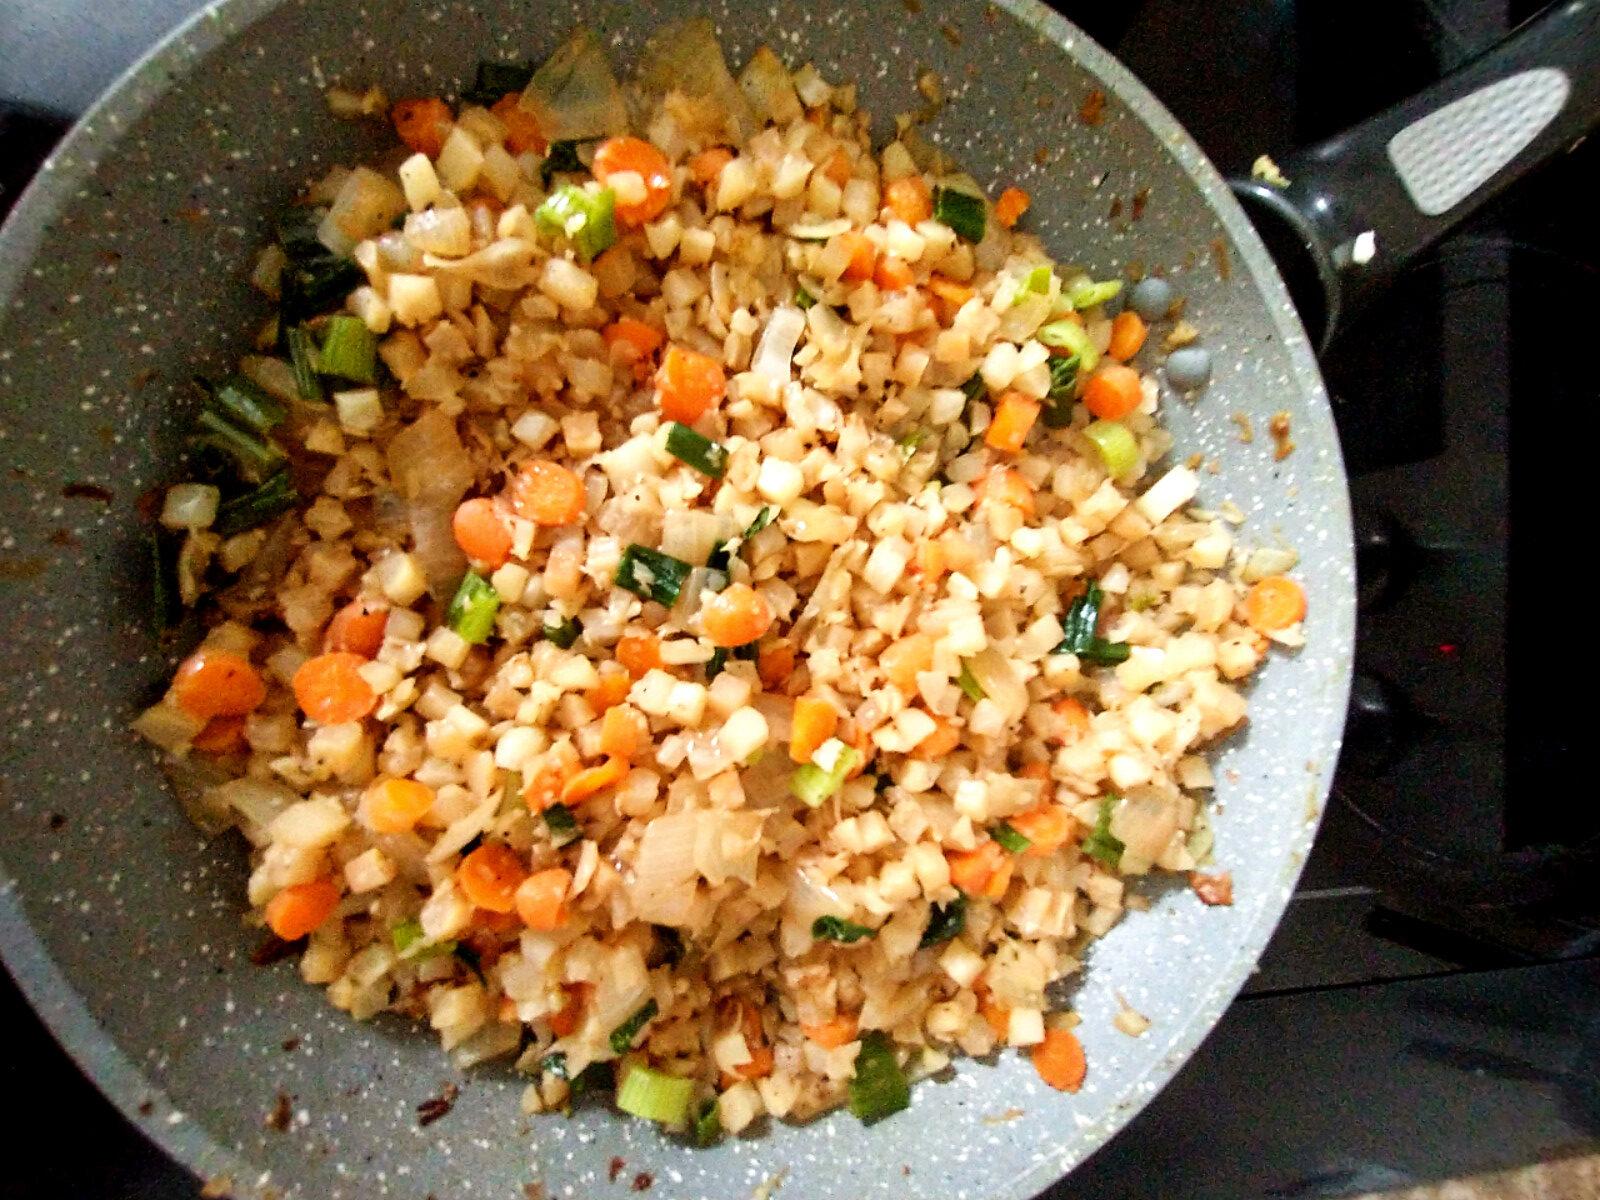 Fried Riced Cauliflower - EggFree | Limitless Allergies